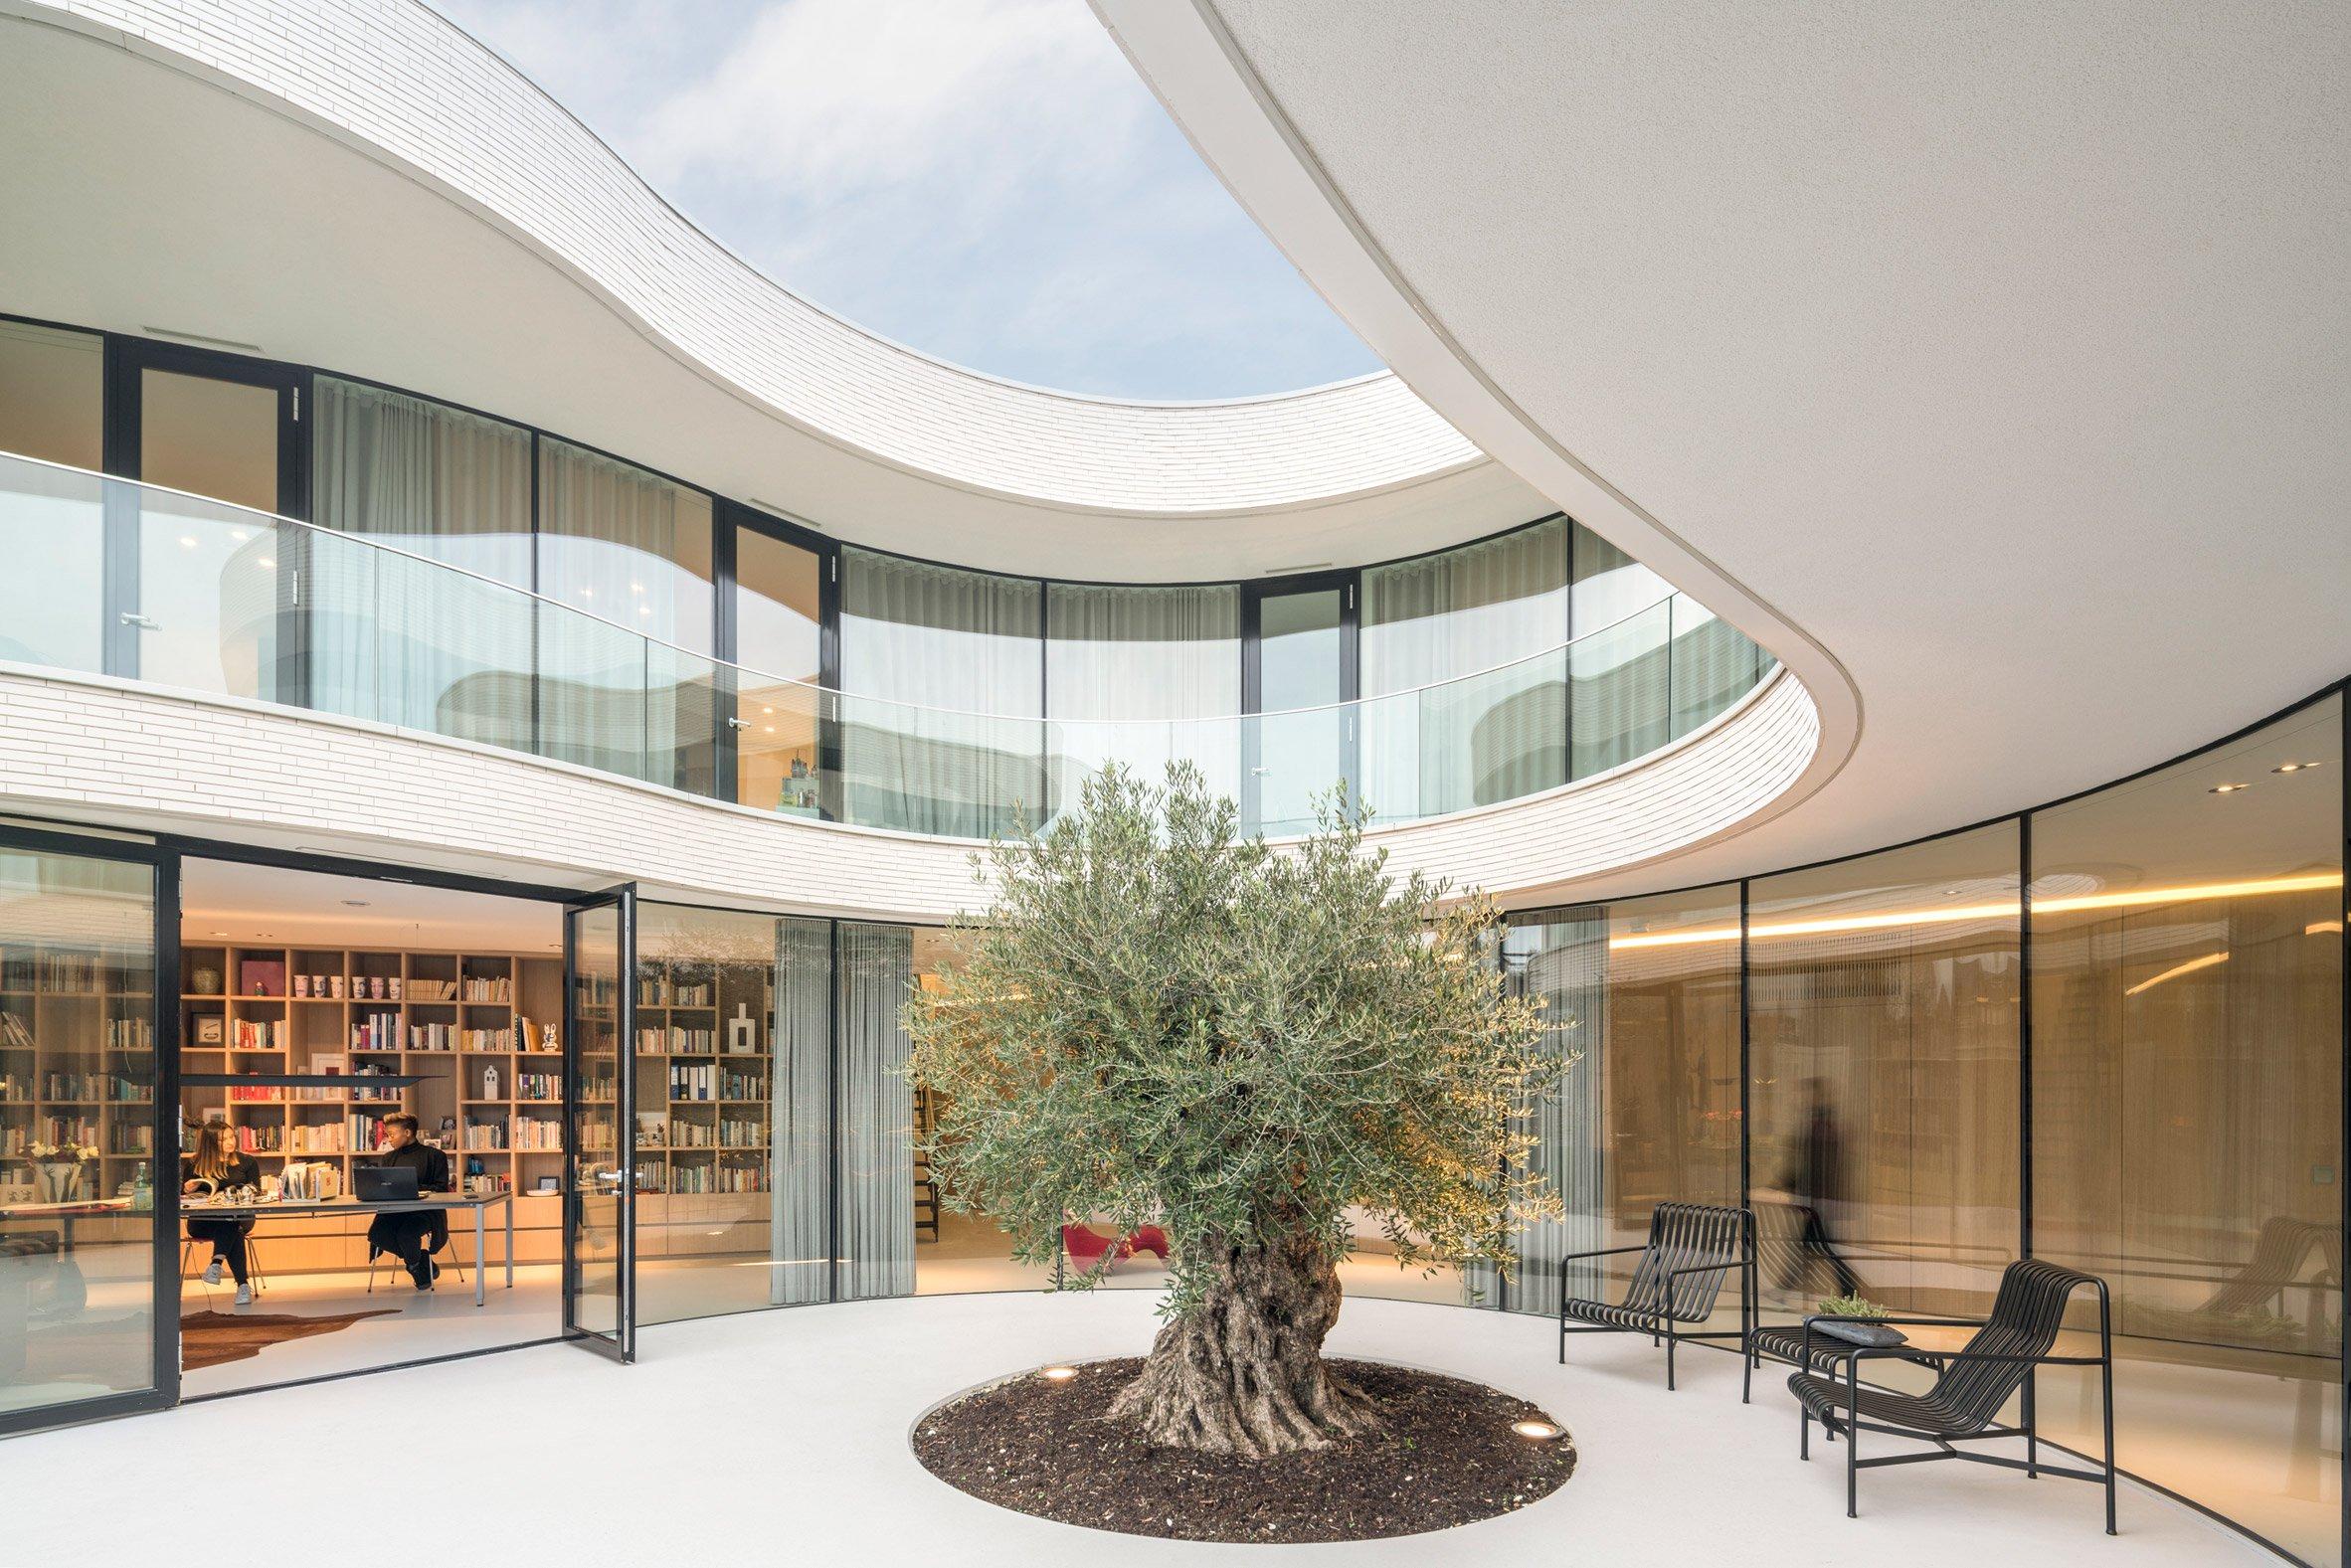 fachada-de-vidro-curvo-em-torno-arvore-oliveira